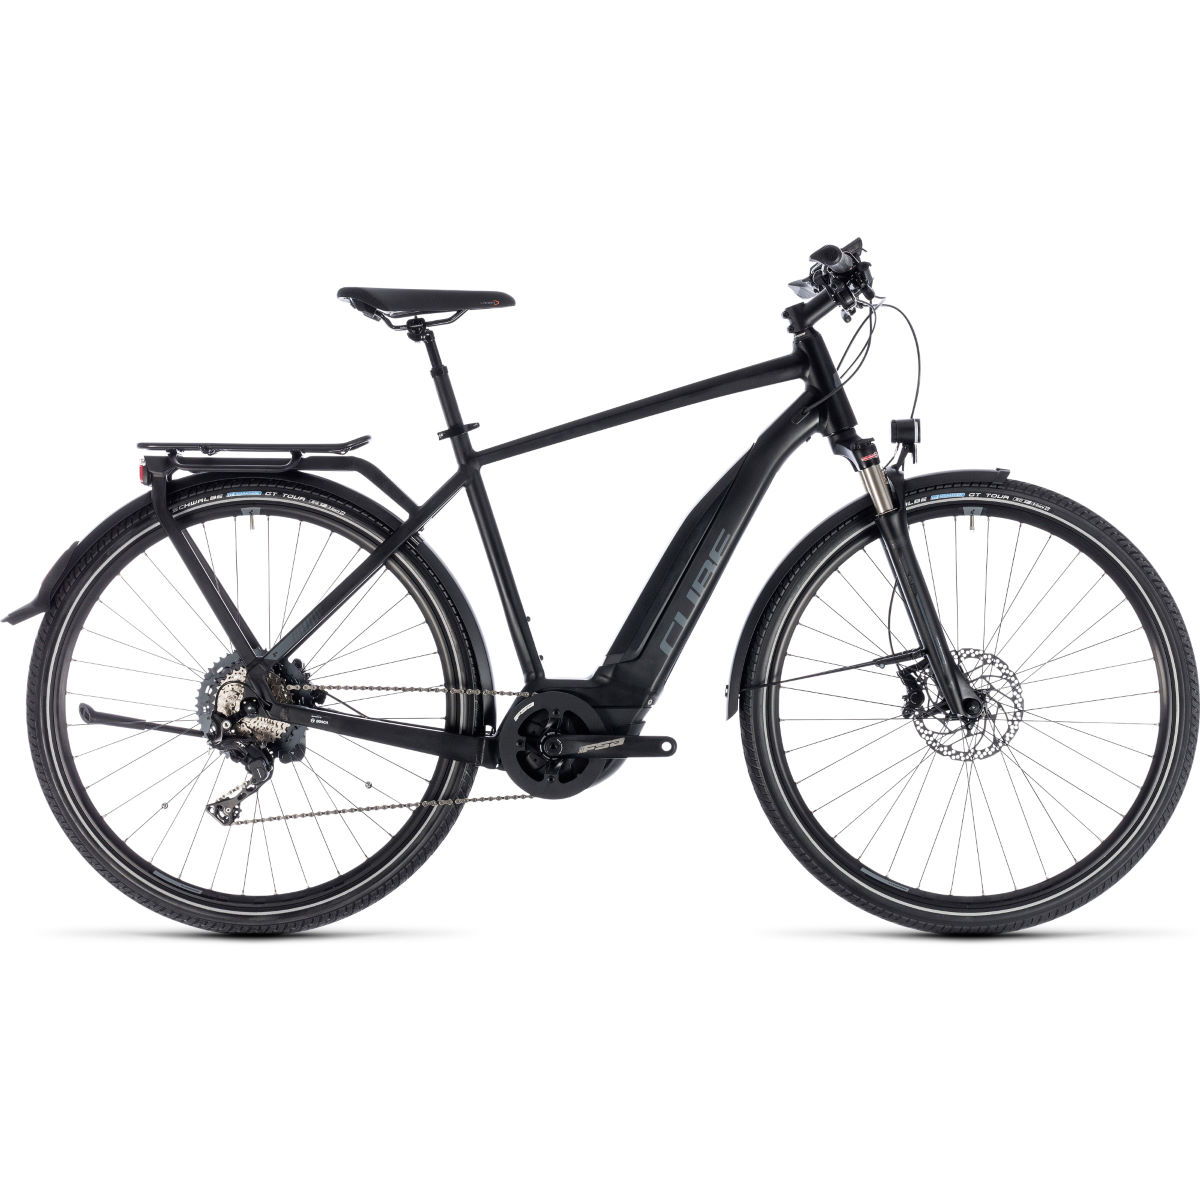 Cube Touring EXC 500 2018 Electric Urban Bikes